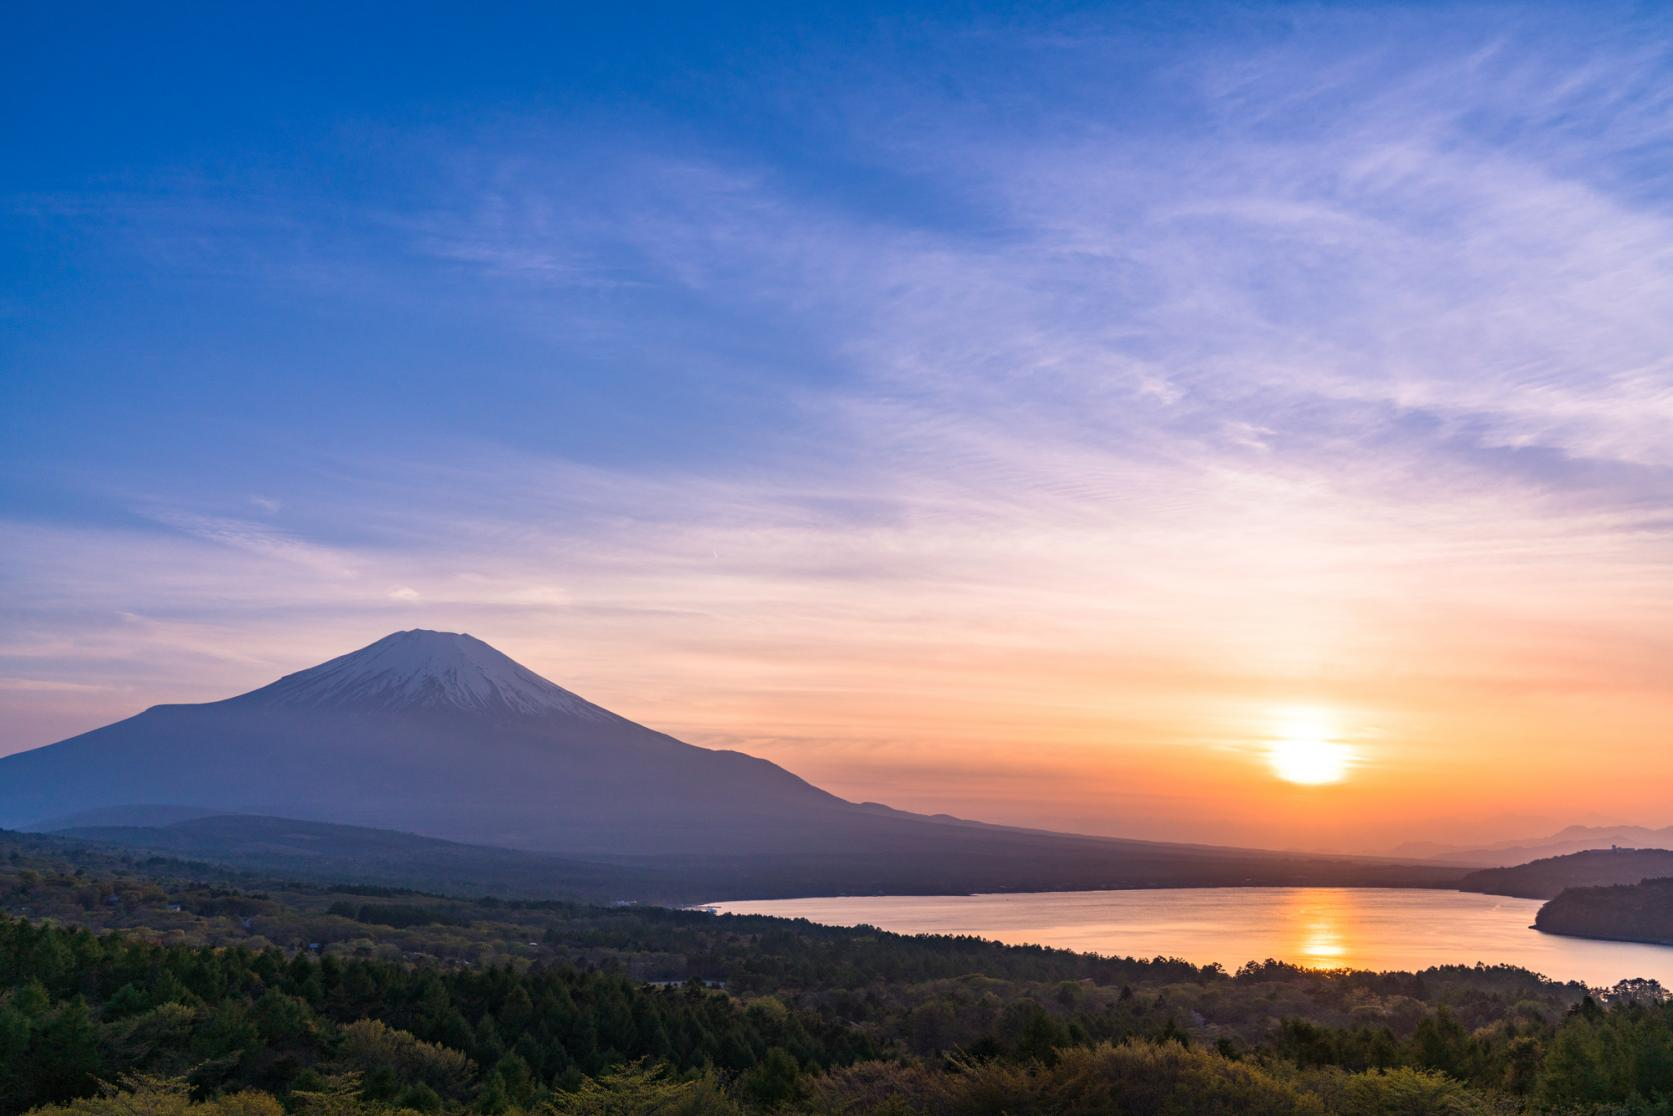 View the beautiful Mt. Fuji